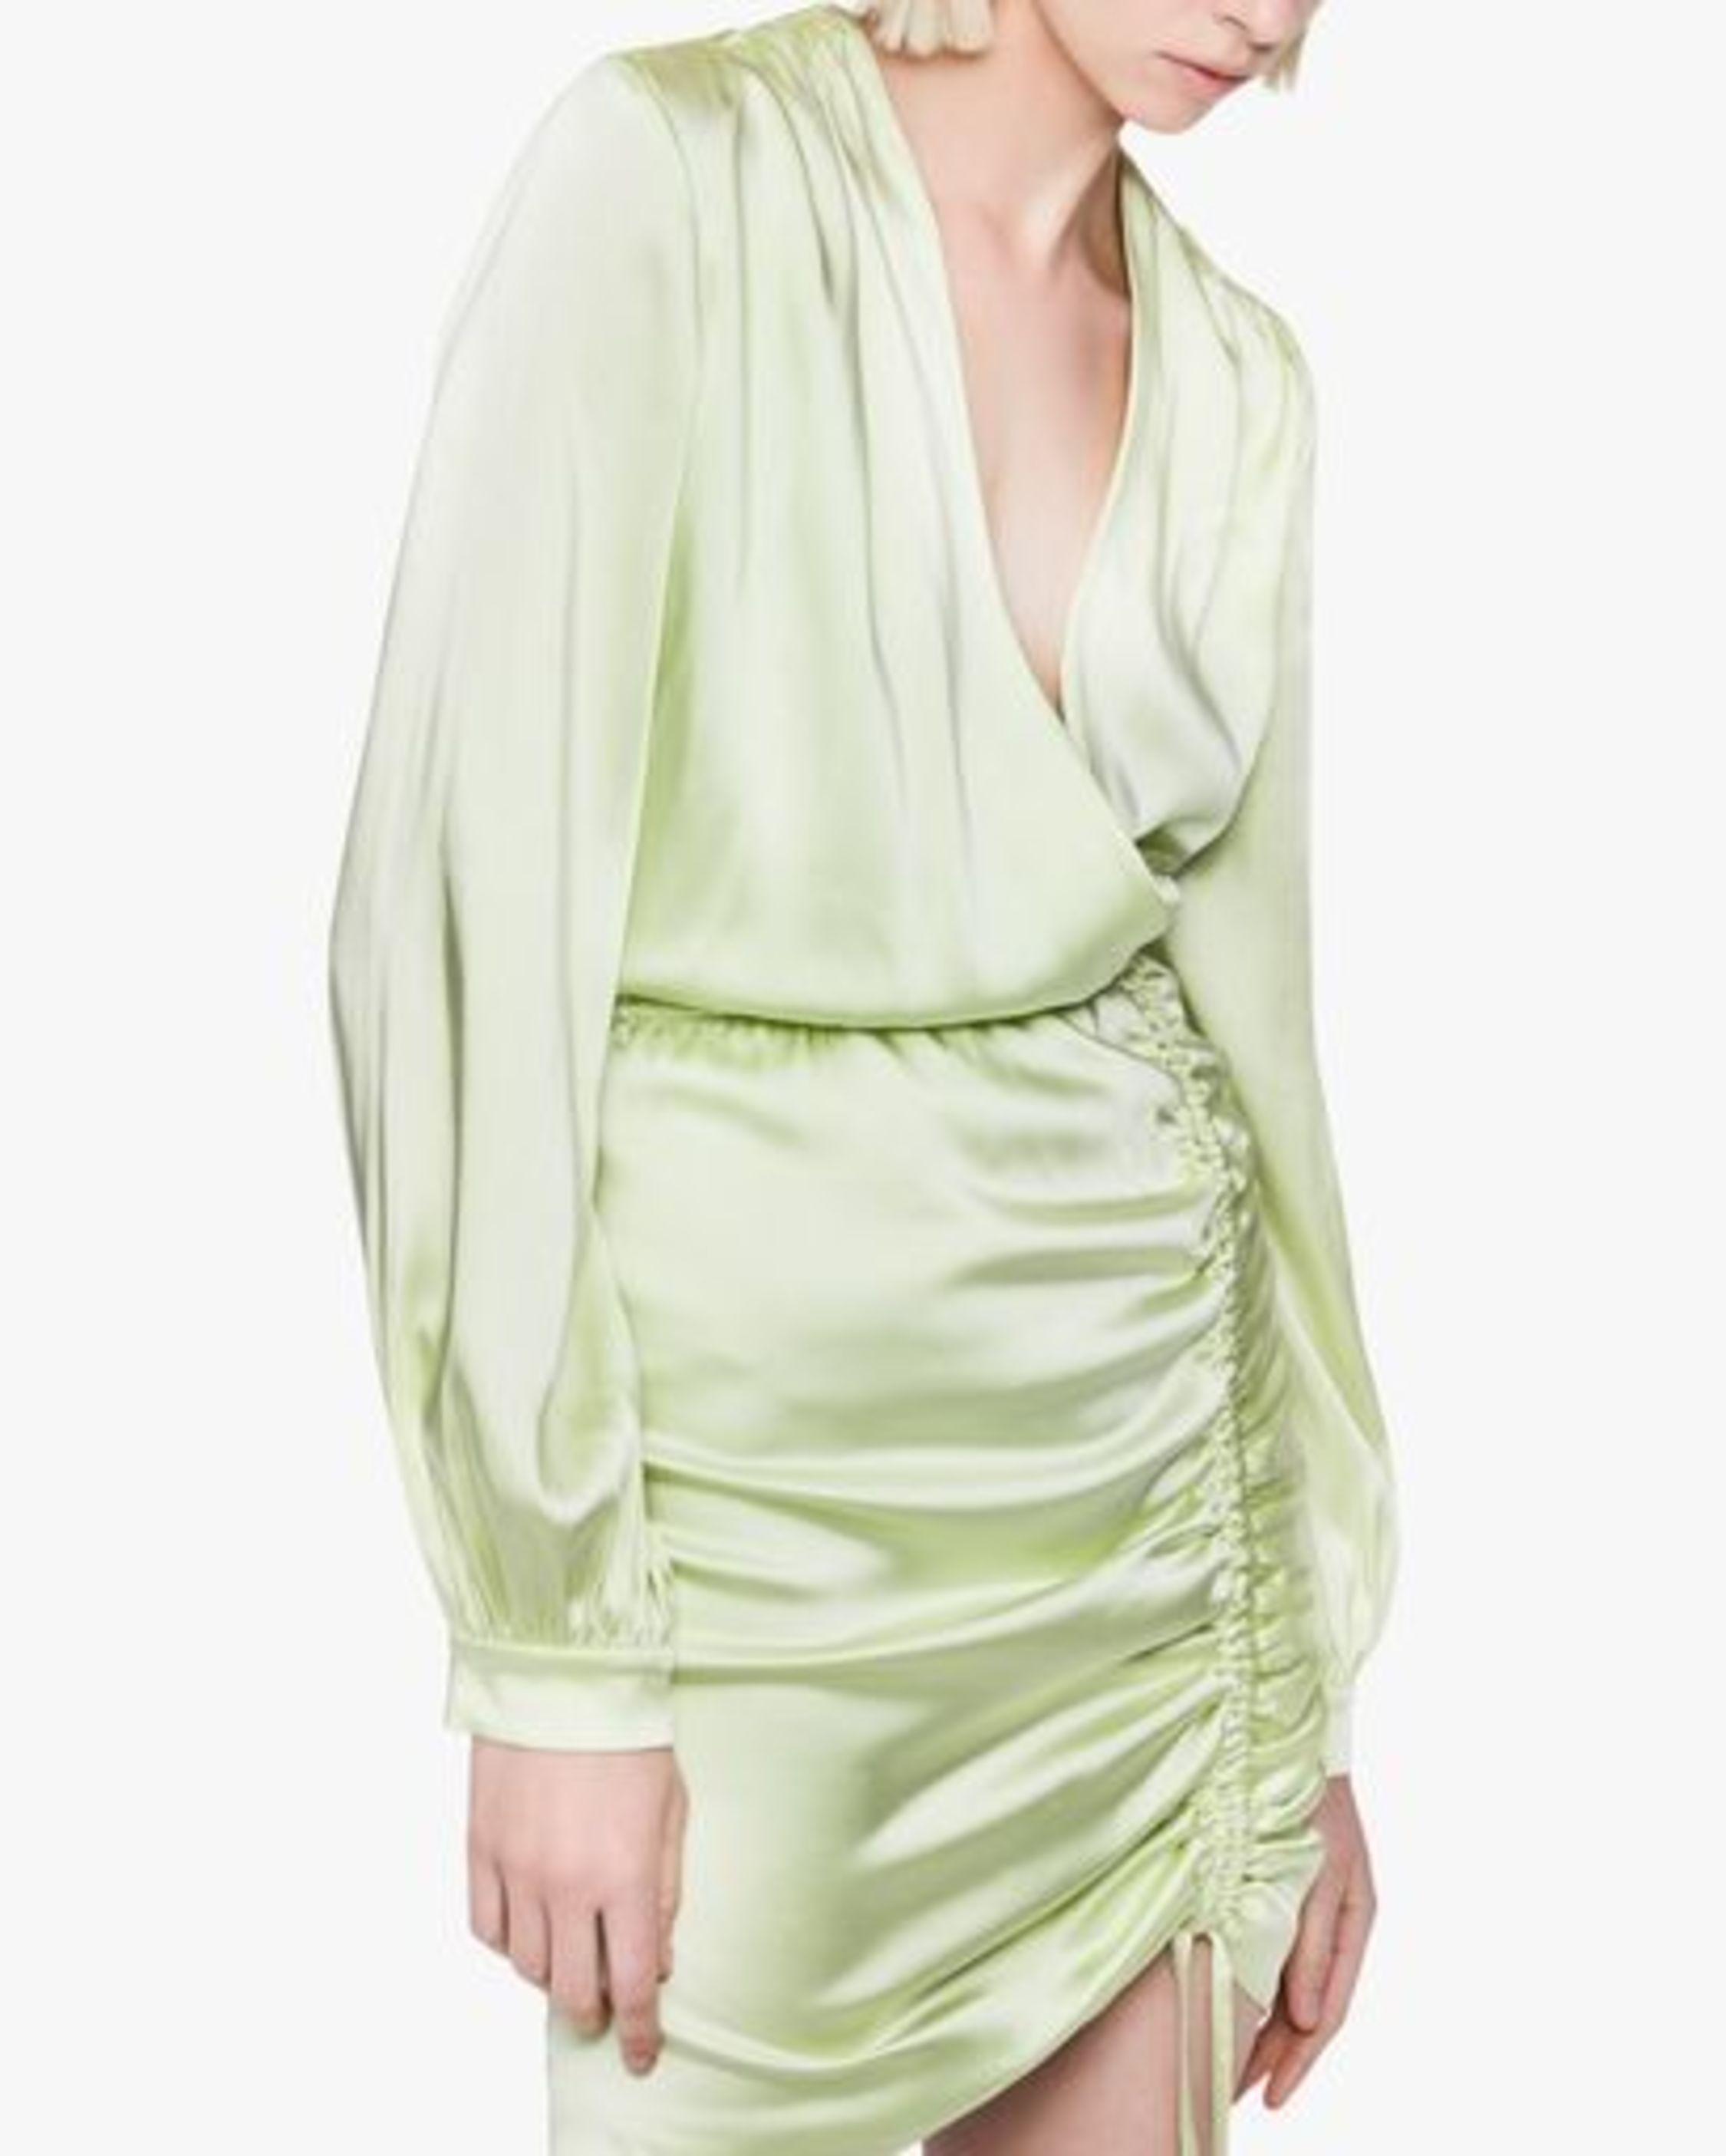 Jonathan Simkhai Justine Fluid Satin Mini Dress 3